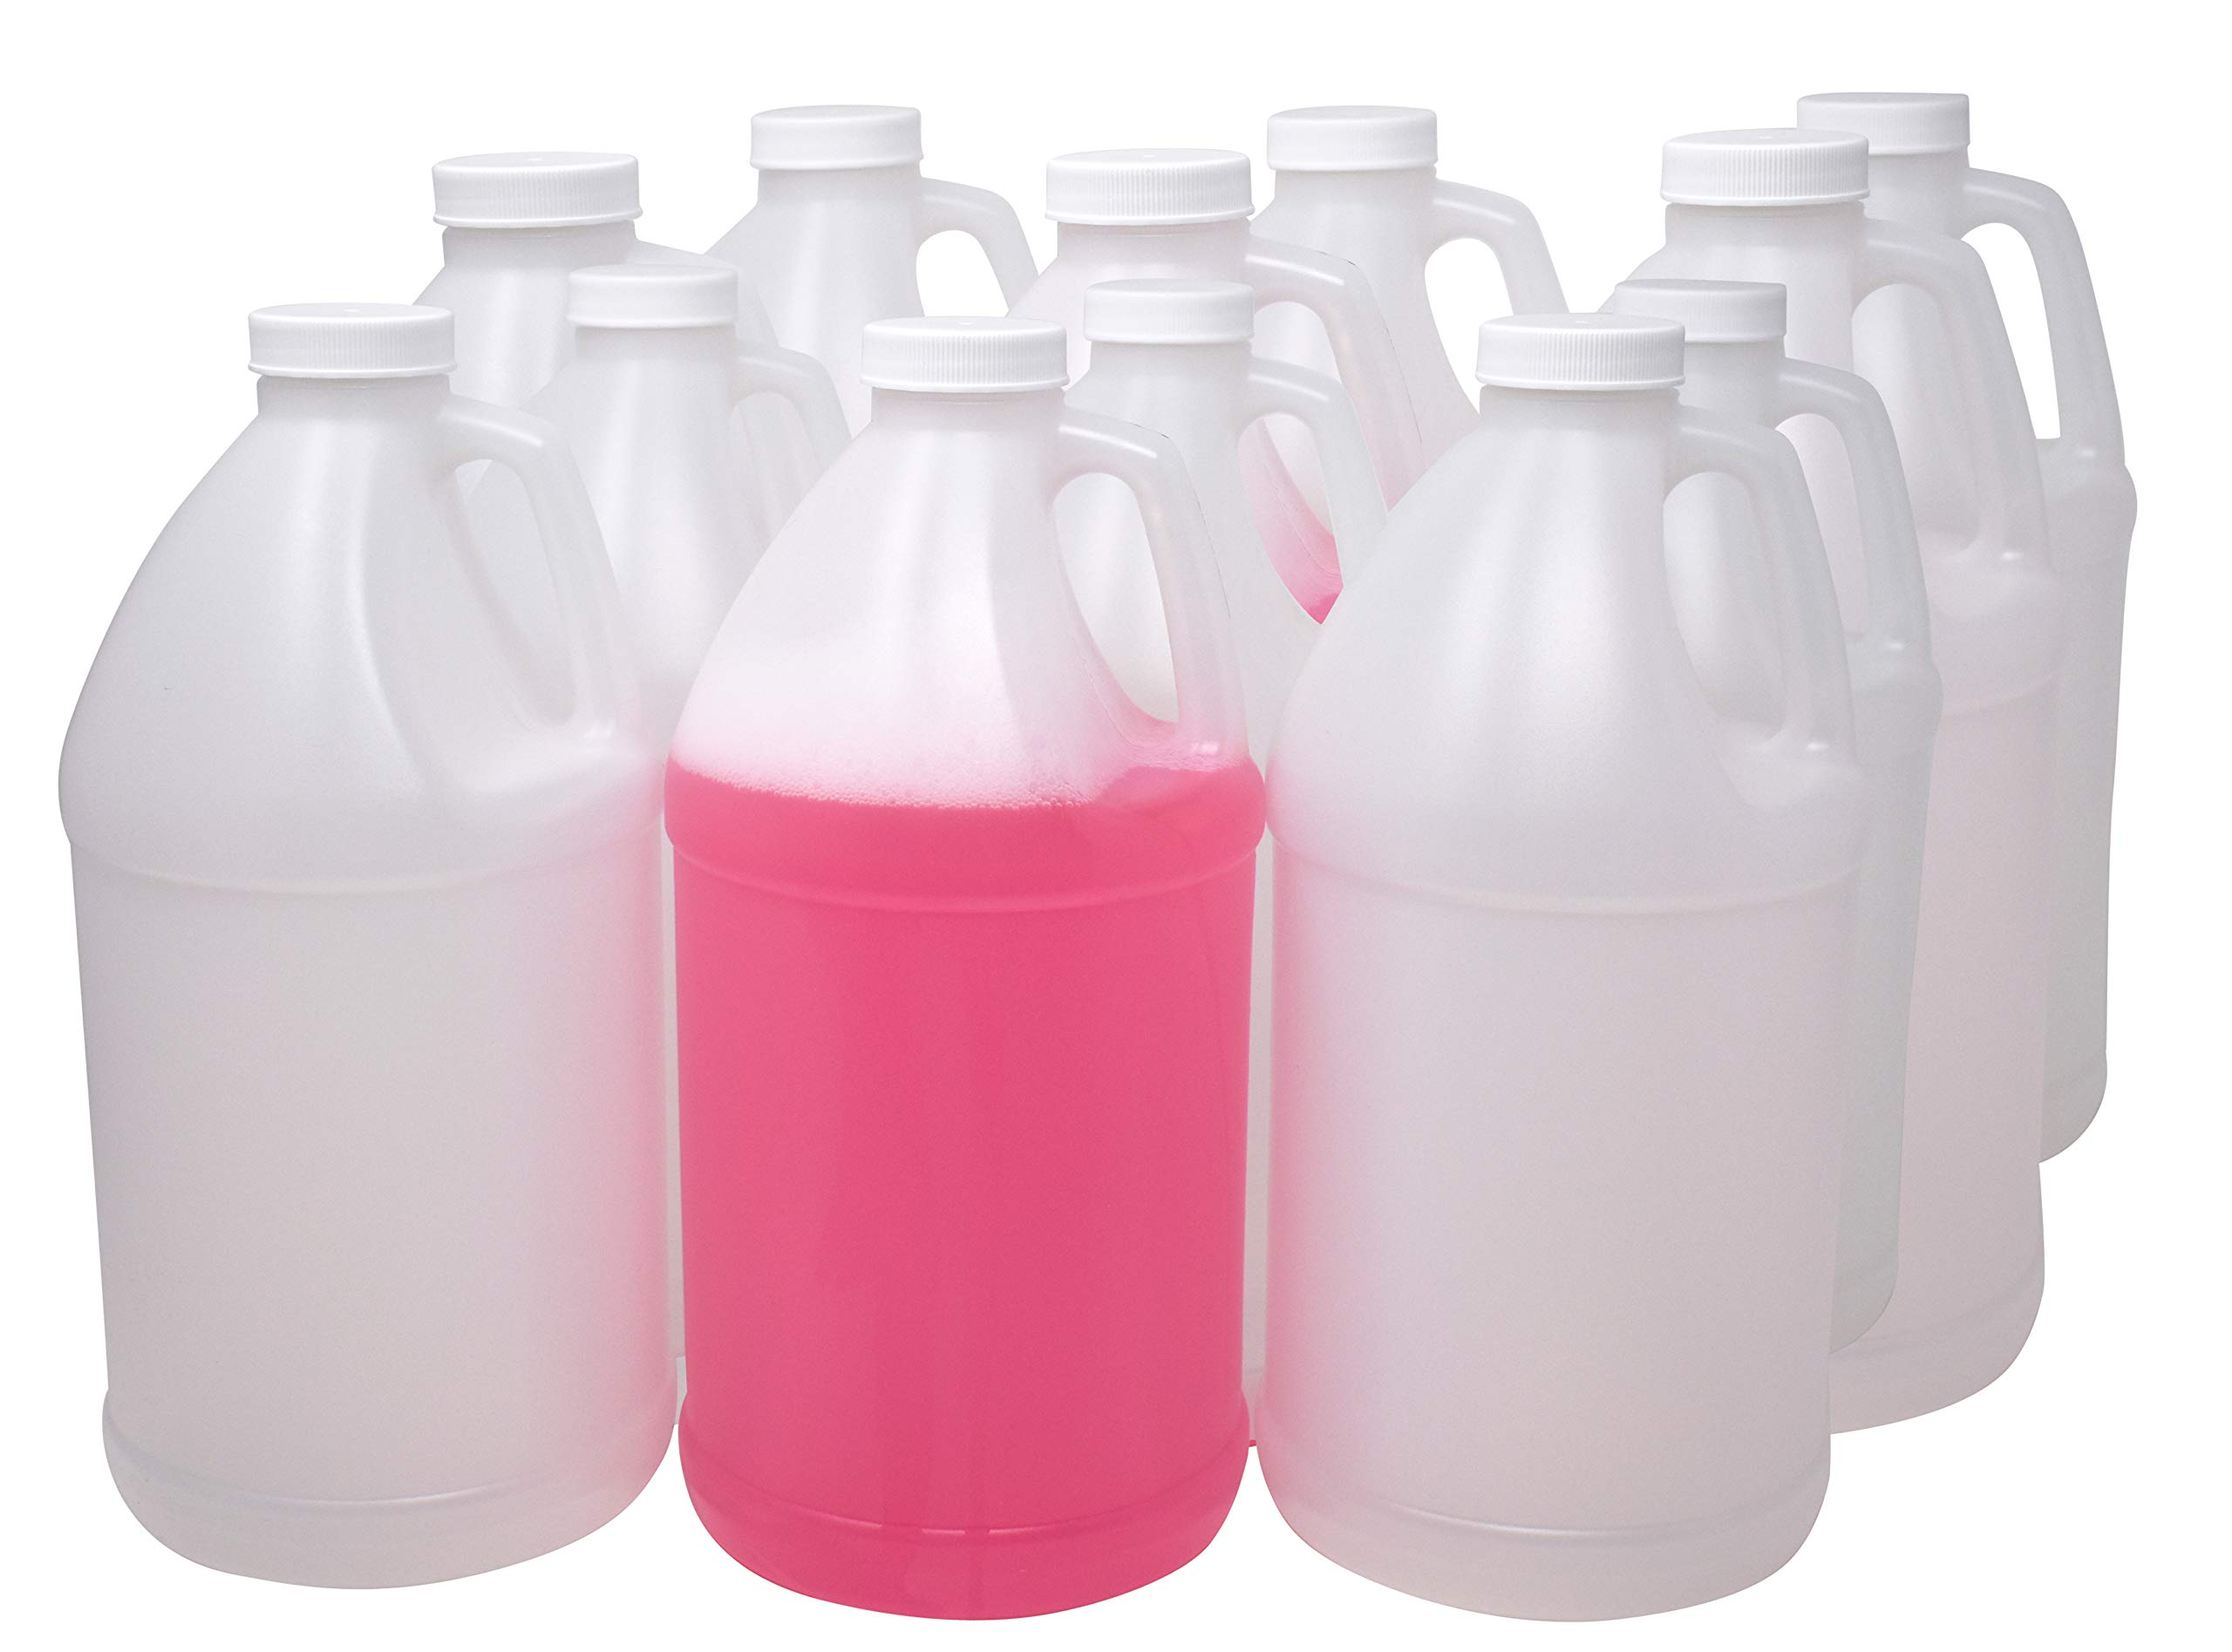 4Spray 1/2 Gallon Jug, 64 oz USP Empty Plastic Bottle - Bpa Free, Natural Color HDPE with 38mm Cap (12)